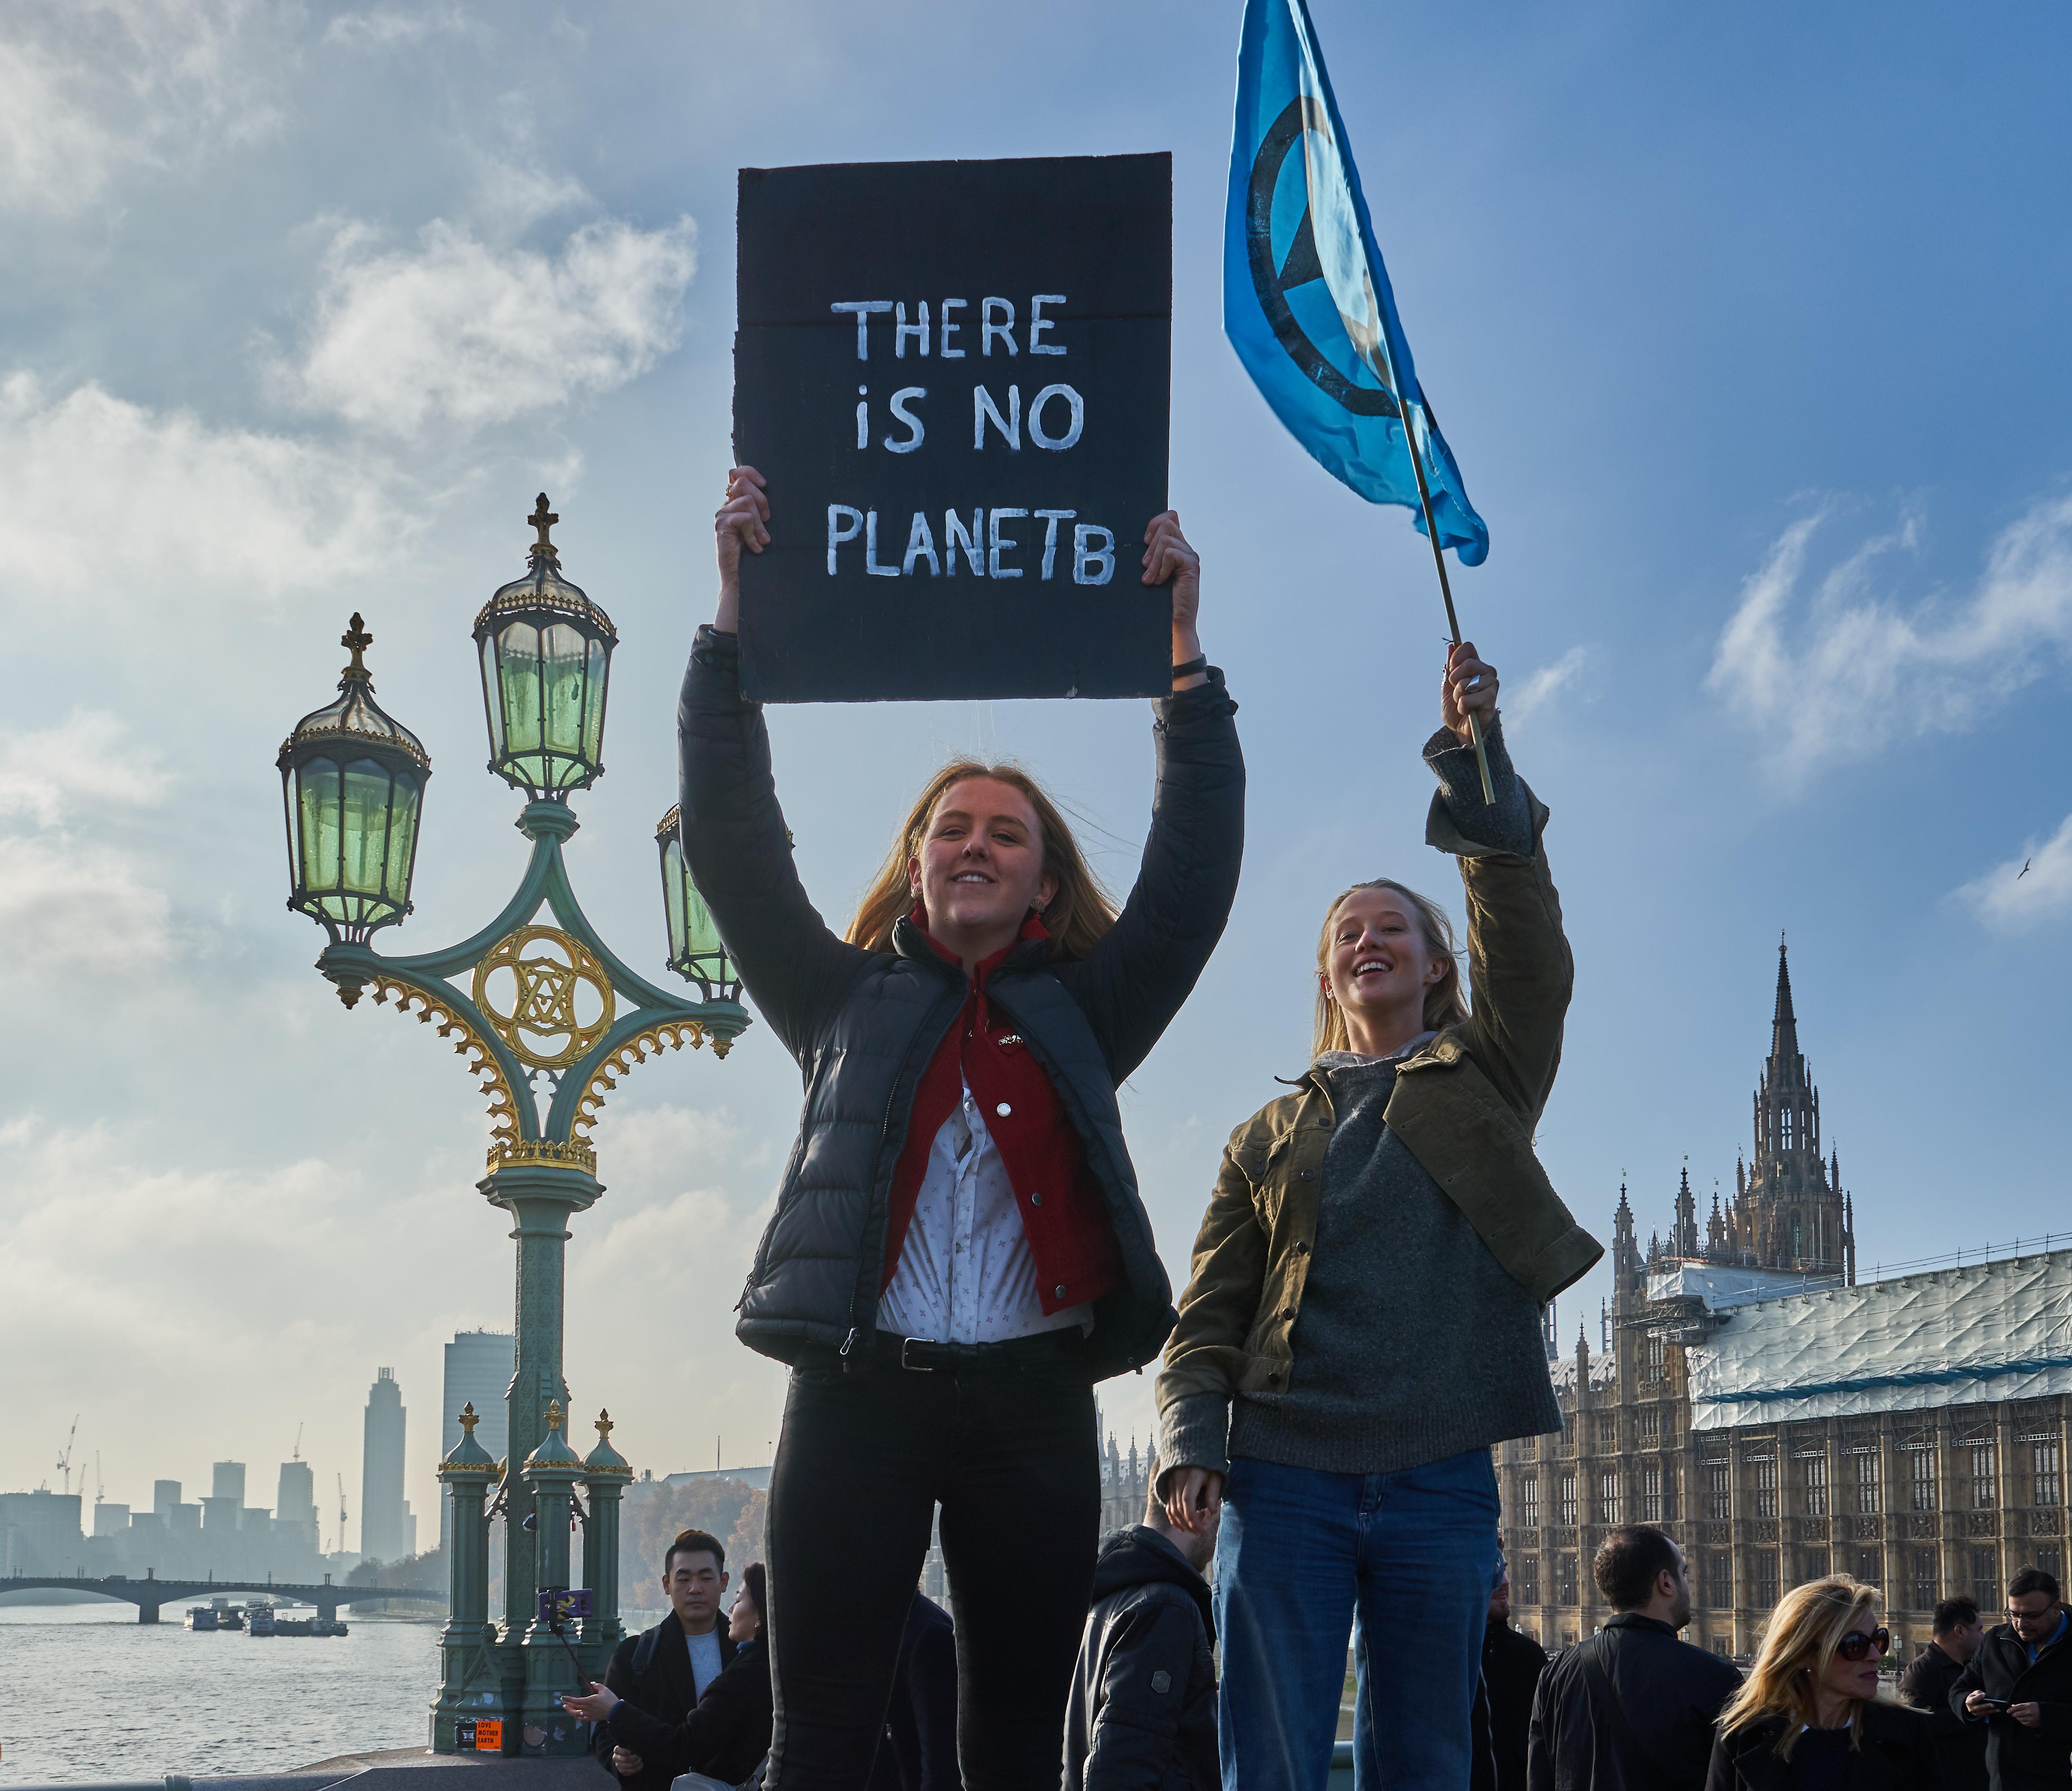 No Planet B!